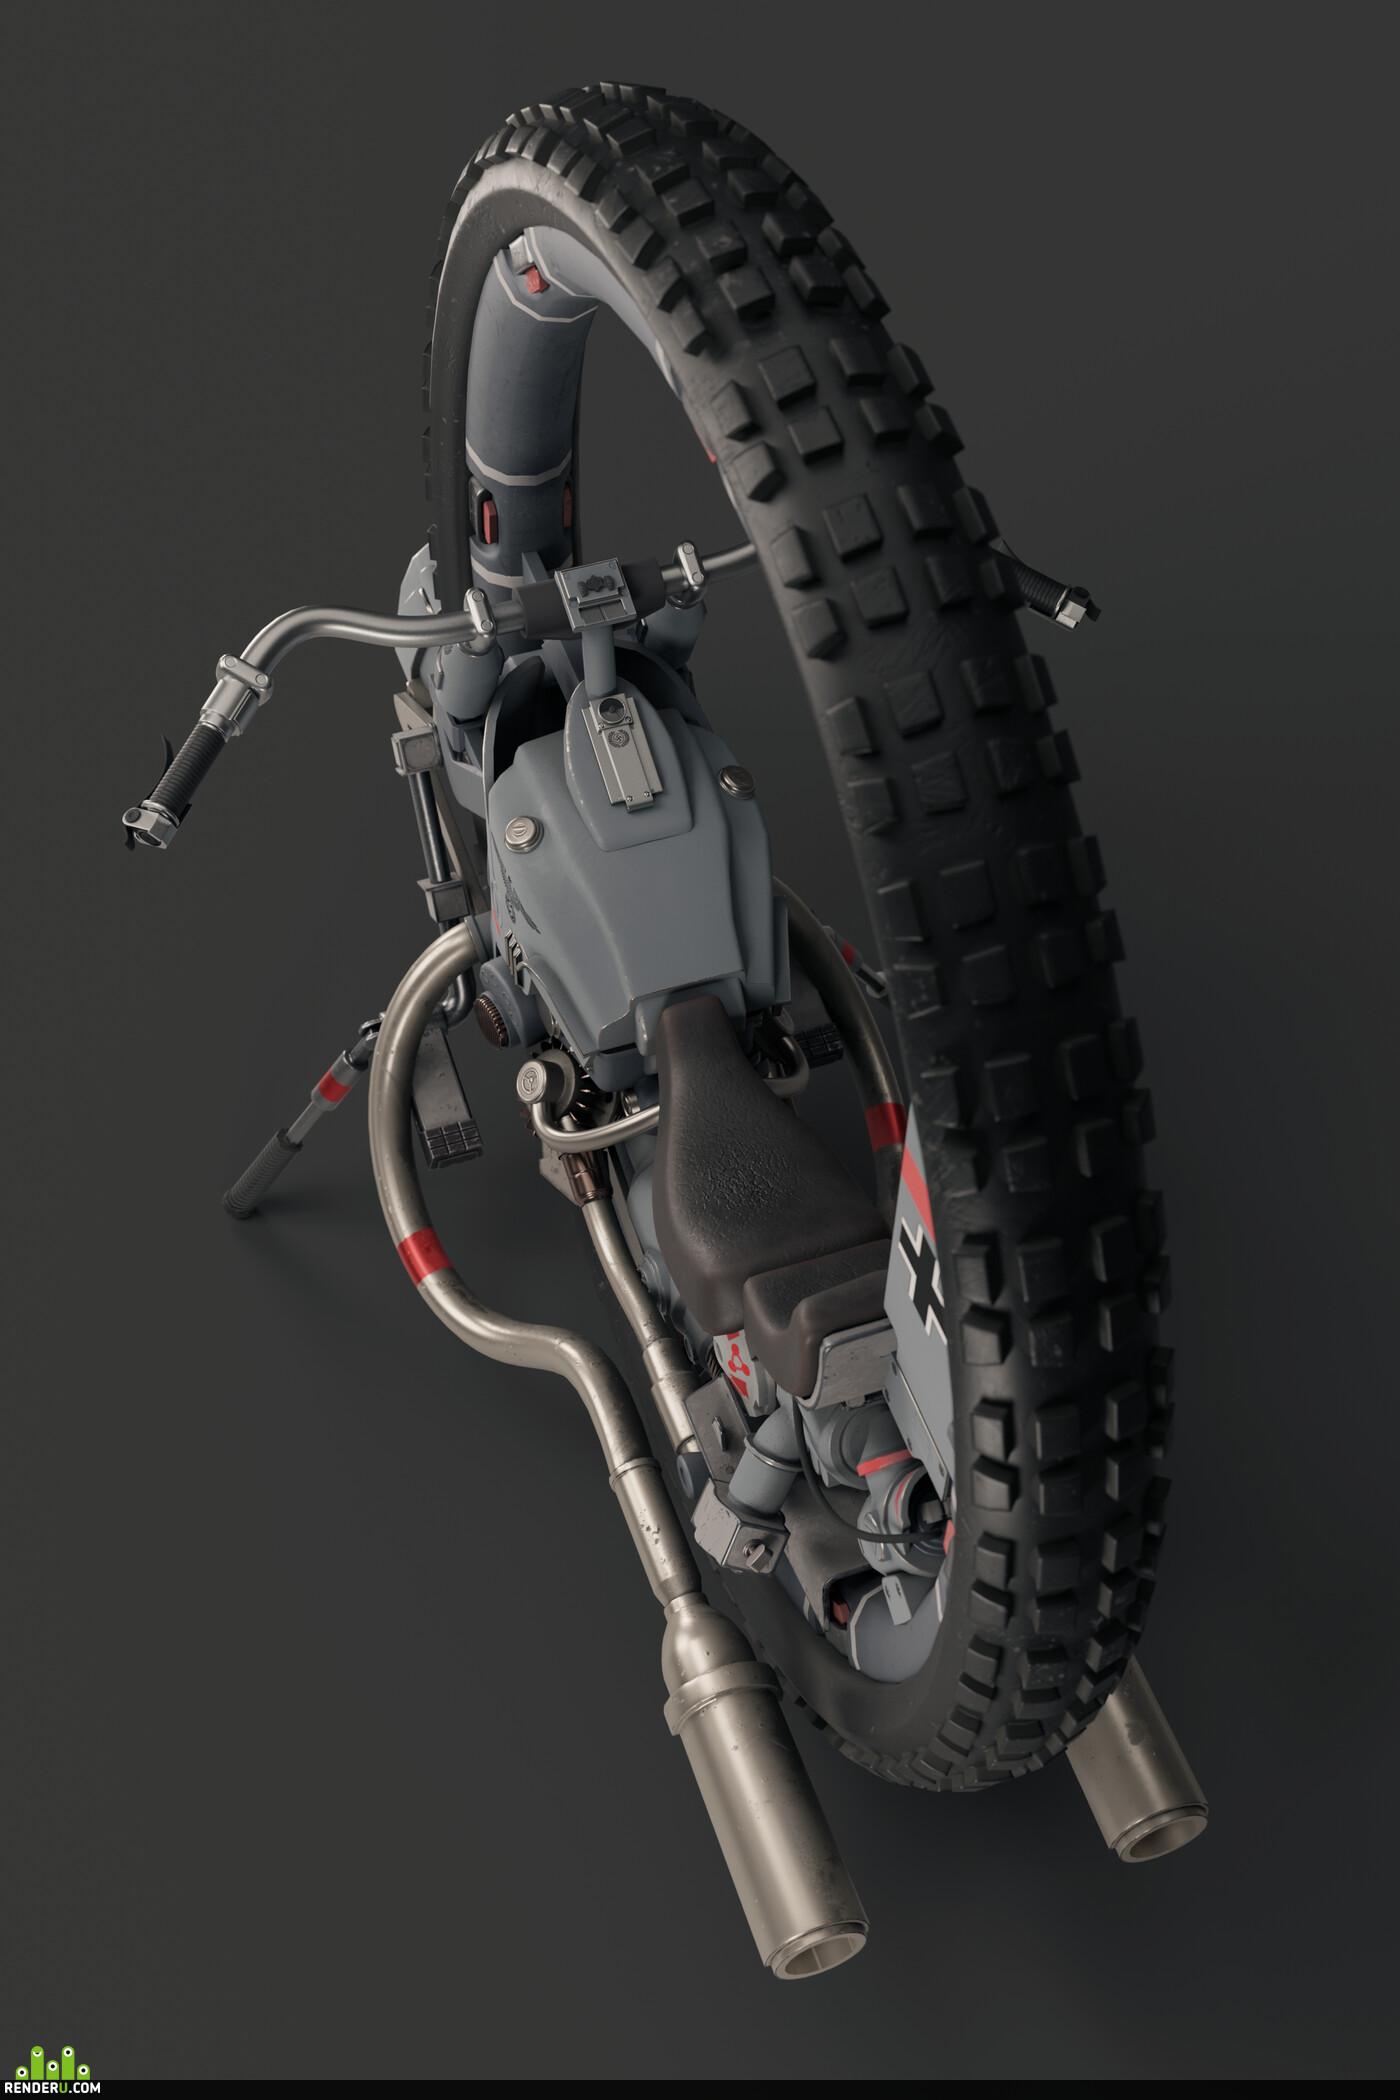 hardsurfacesmodeling, 3d model, Digital 3D, Transport & Vehicles, Combat vehicles